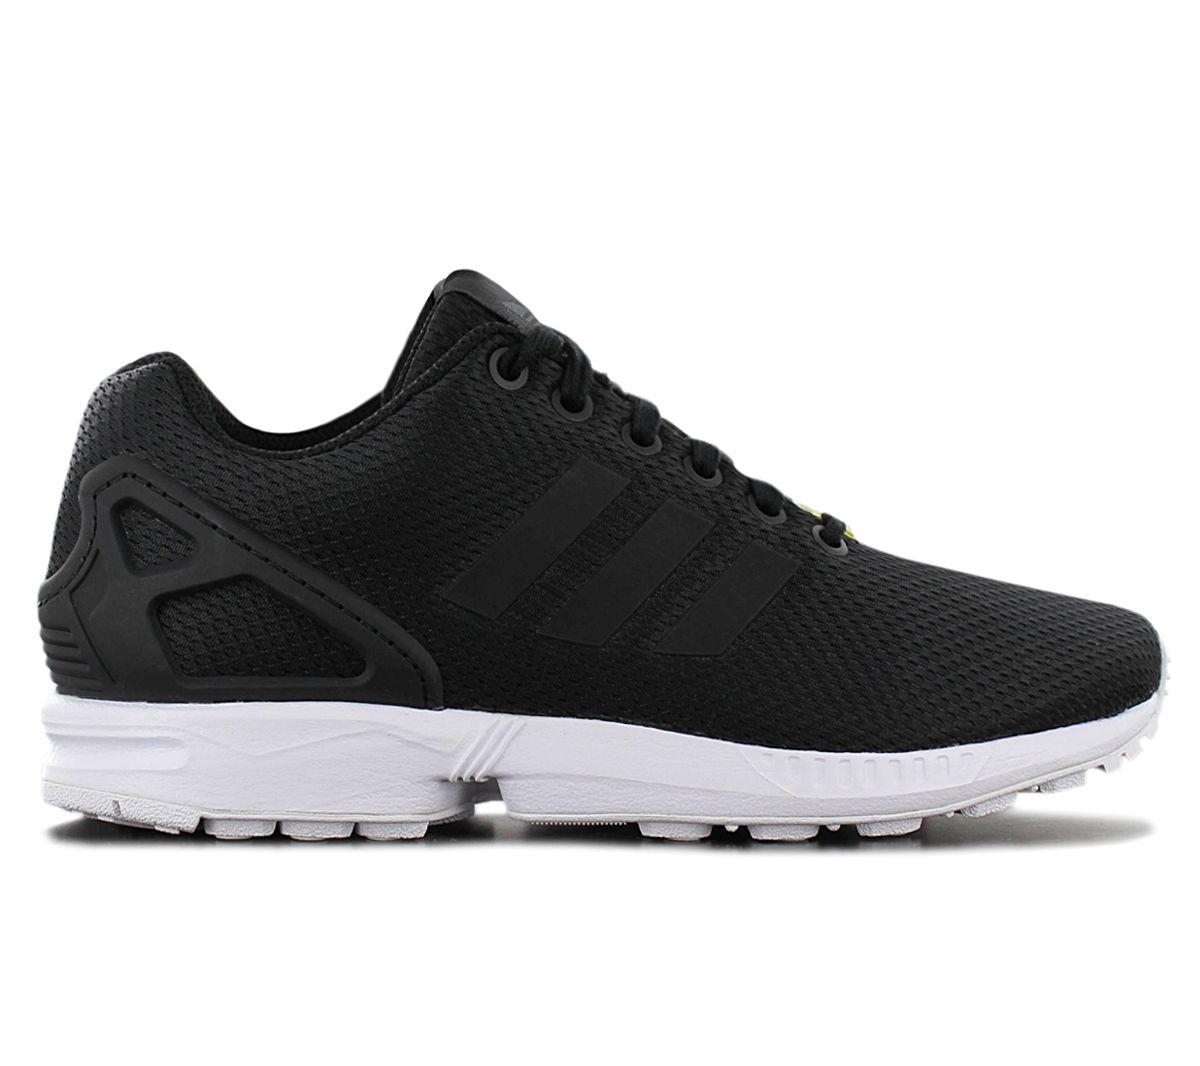 adidas zx flux originals schuhe sneaker sportschuhe. Black Bedroom Furniture Sets. Home Design Ideas